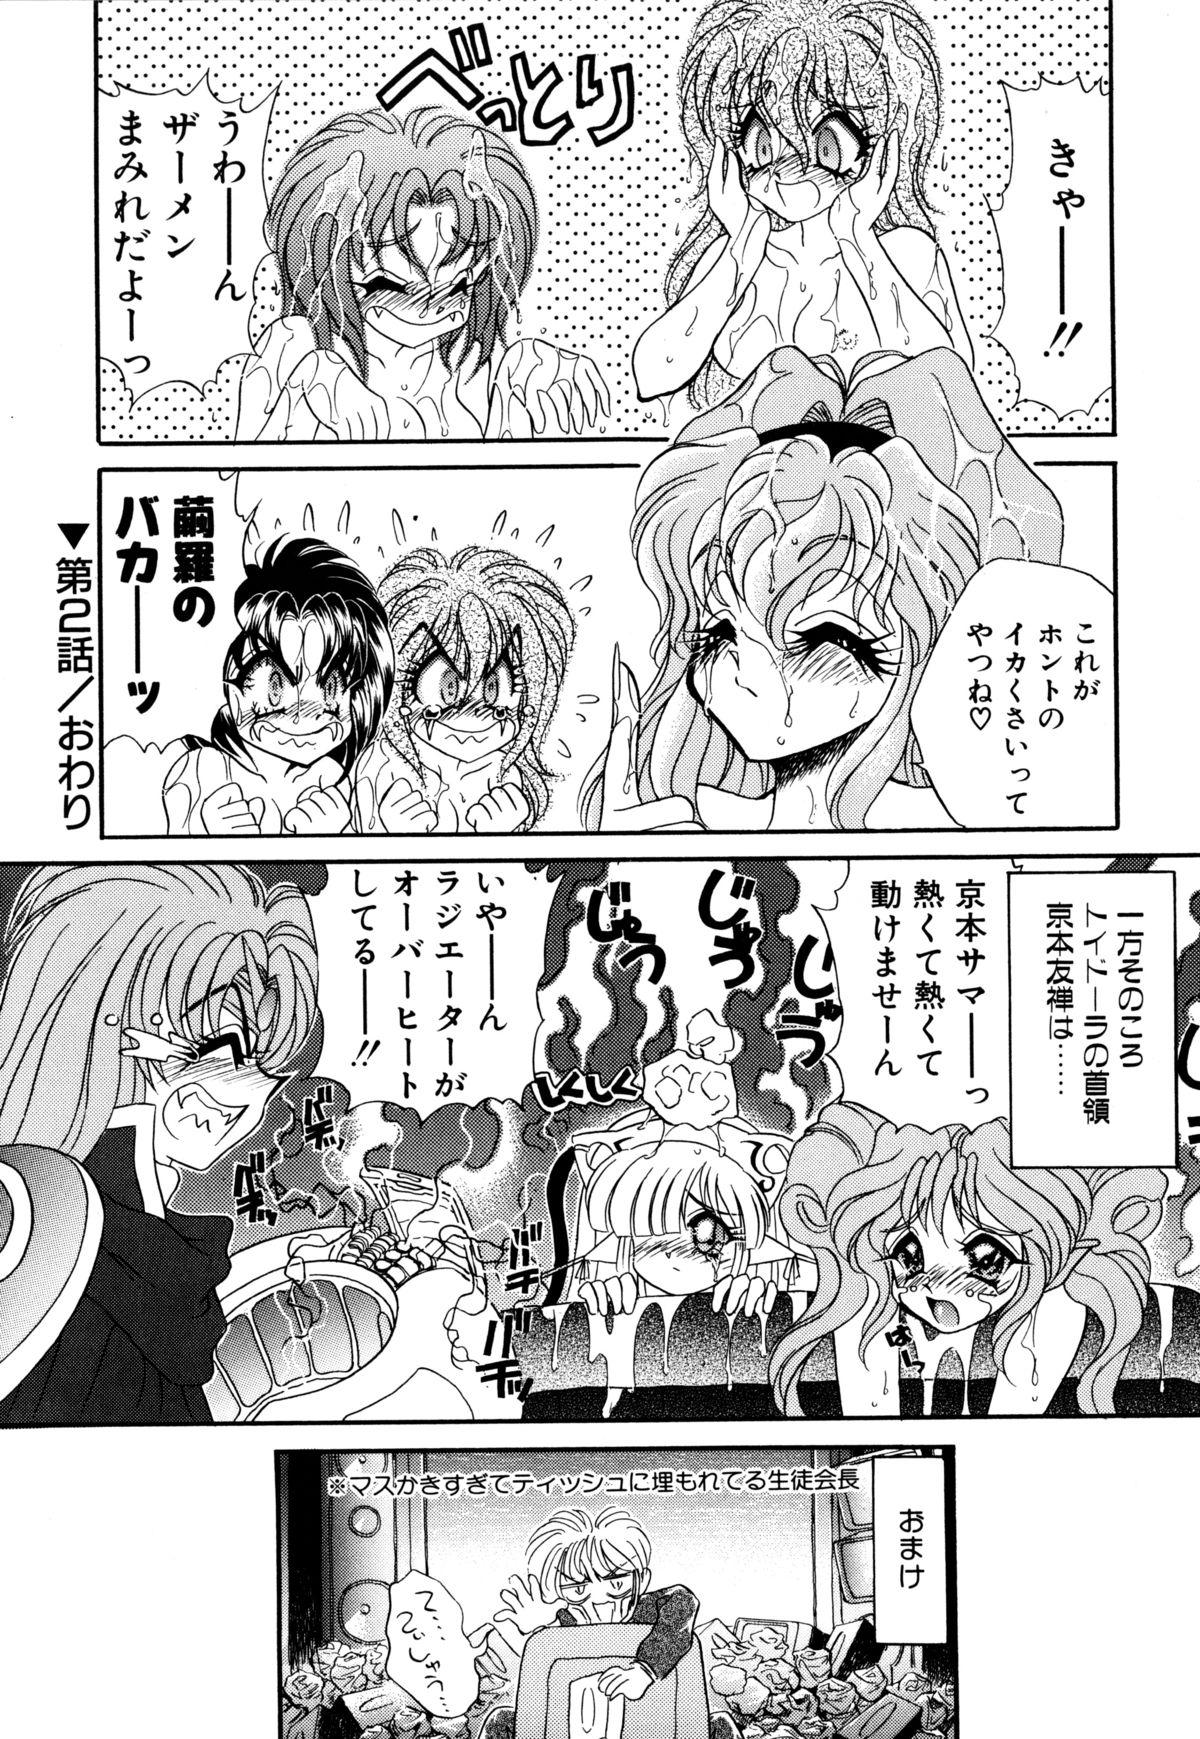 Kigurumi Sentai Quiltian 40